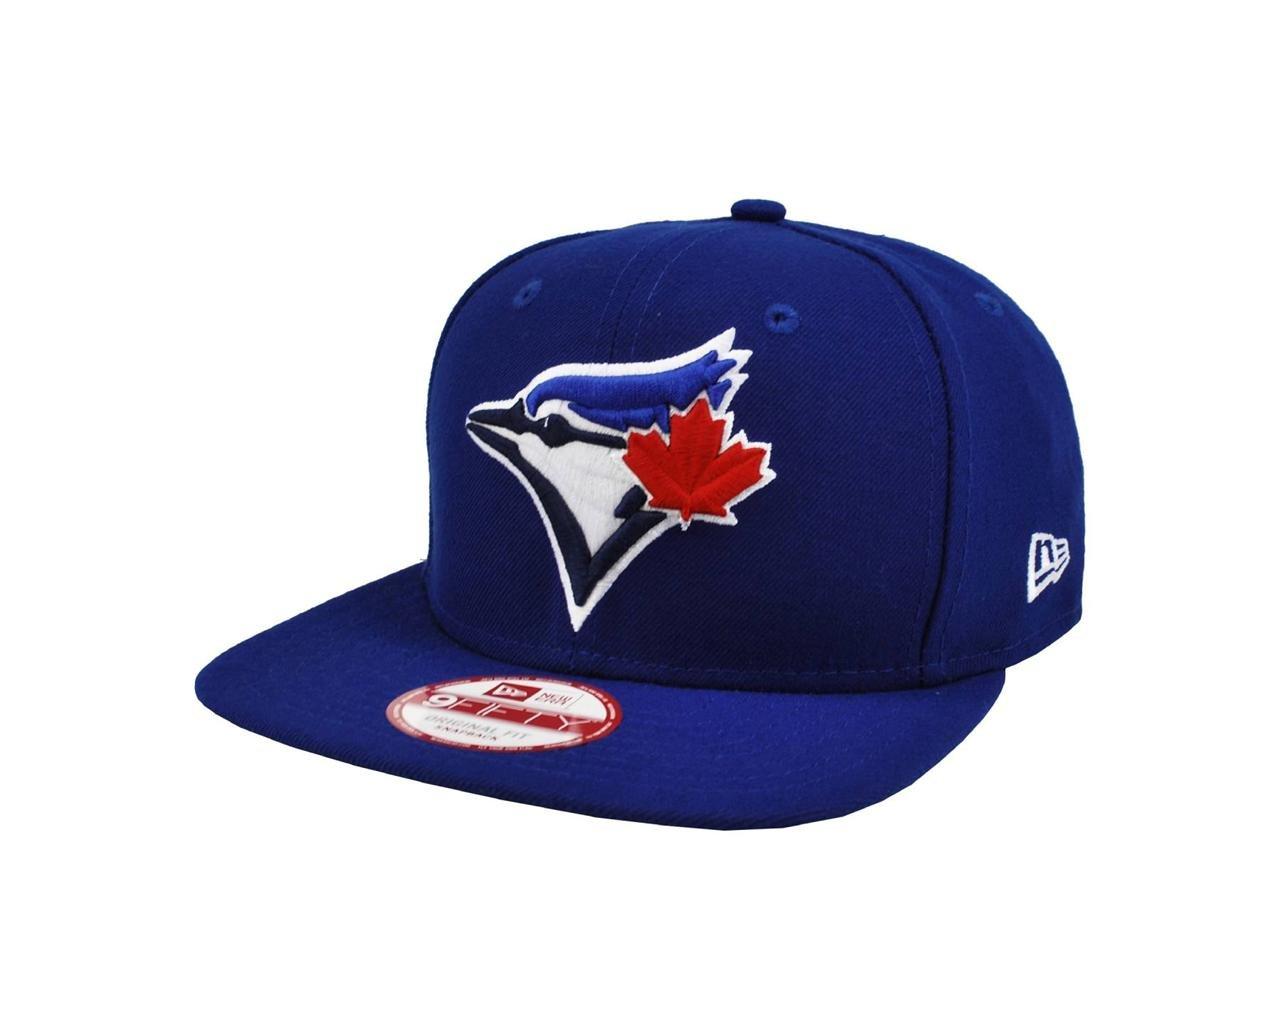 promo code 94365 2209d Amazon.com   NEW ERA 9fifty MLB HAT Toronto Blue Jays Practice Royal Blue  Cap   Sports   Outdoors